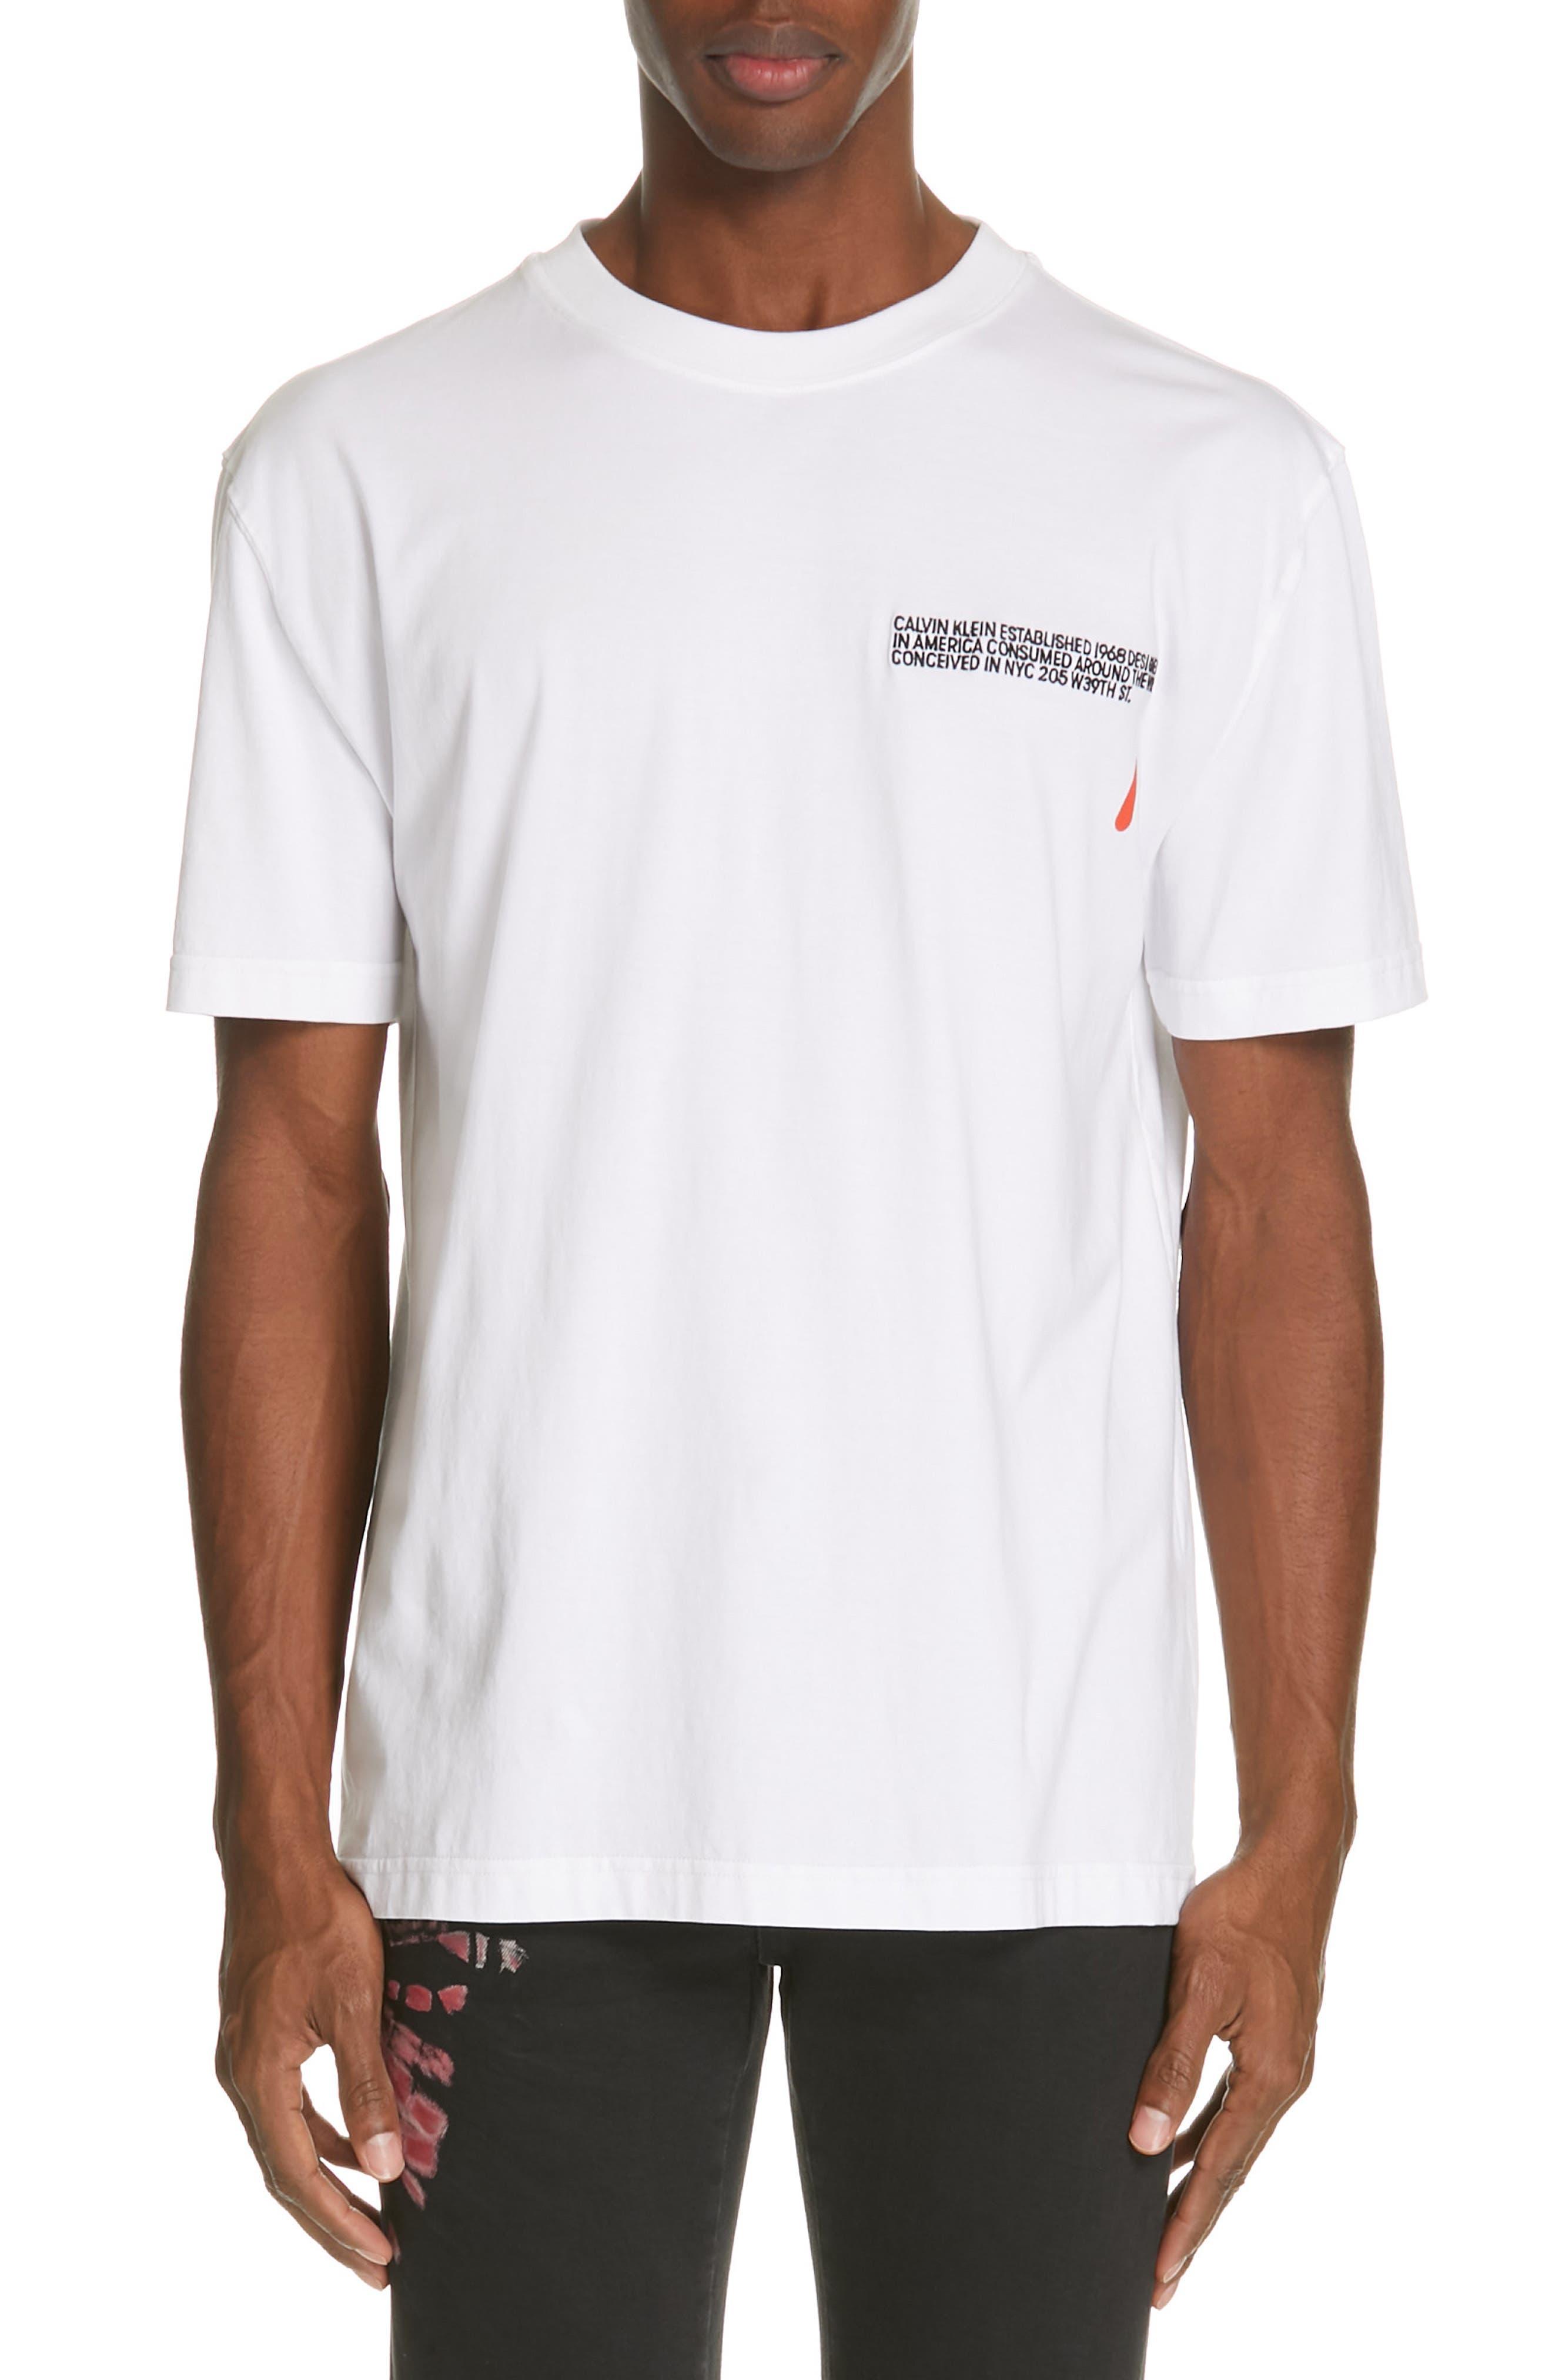 CALVIN KLEIN 205W39NYC Logo T-Shirt, Main, color, OPTIC WHITE